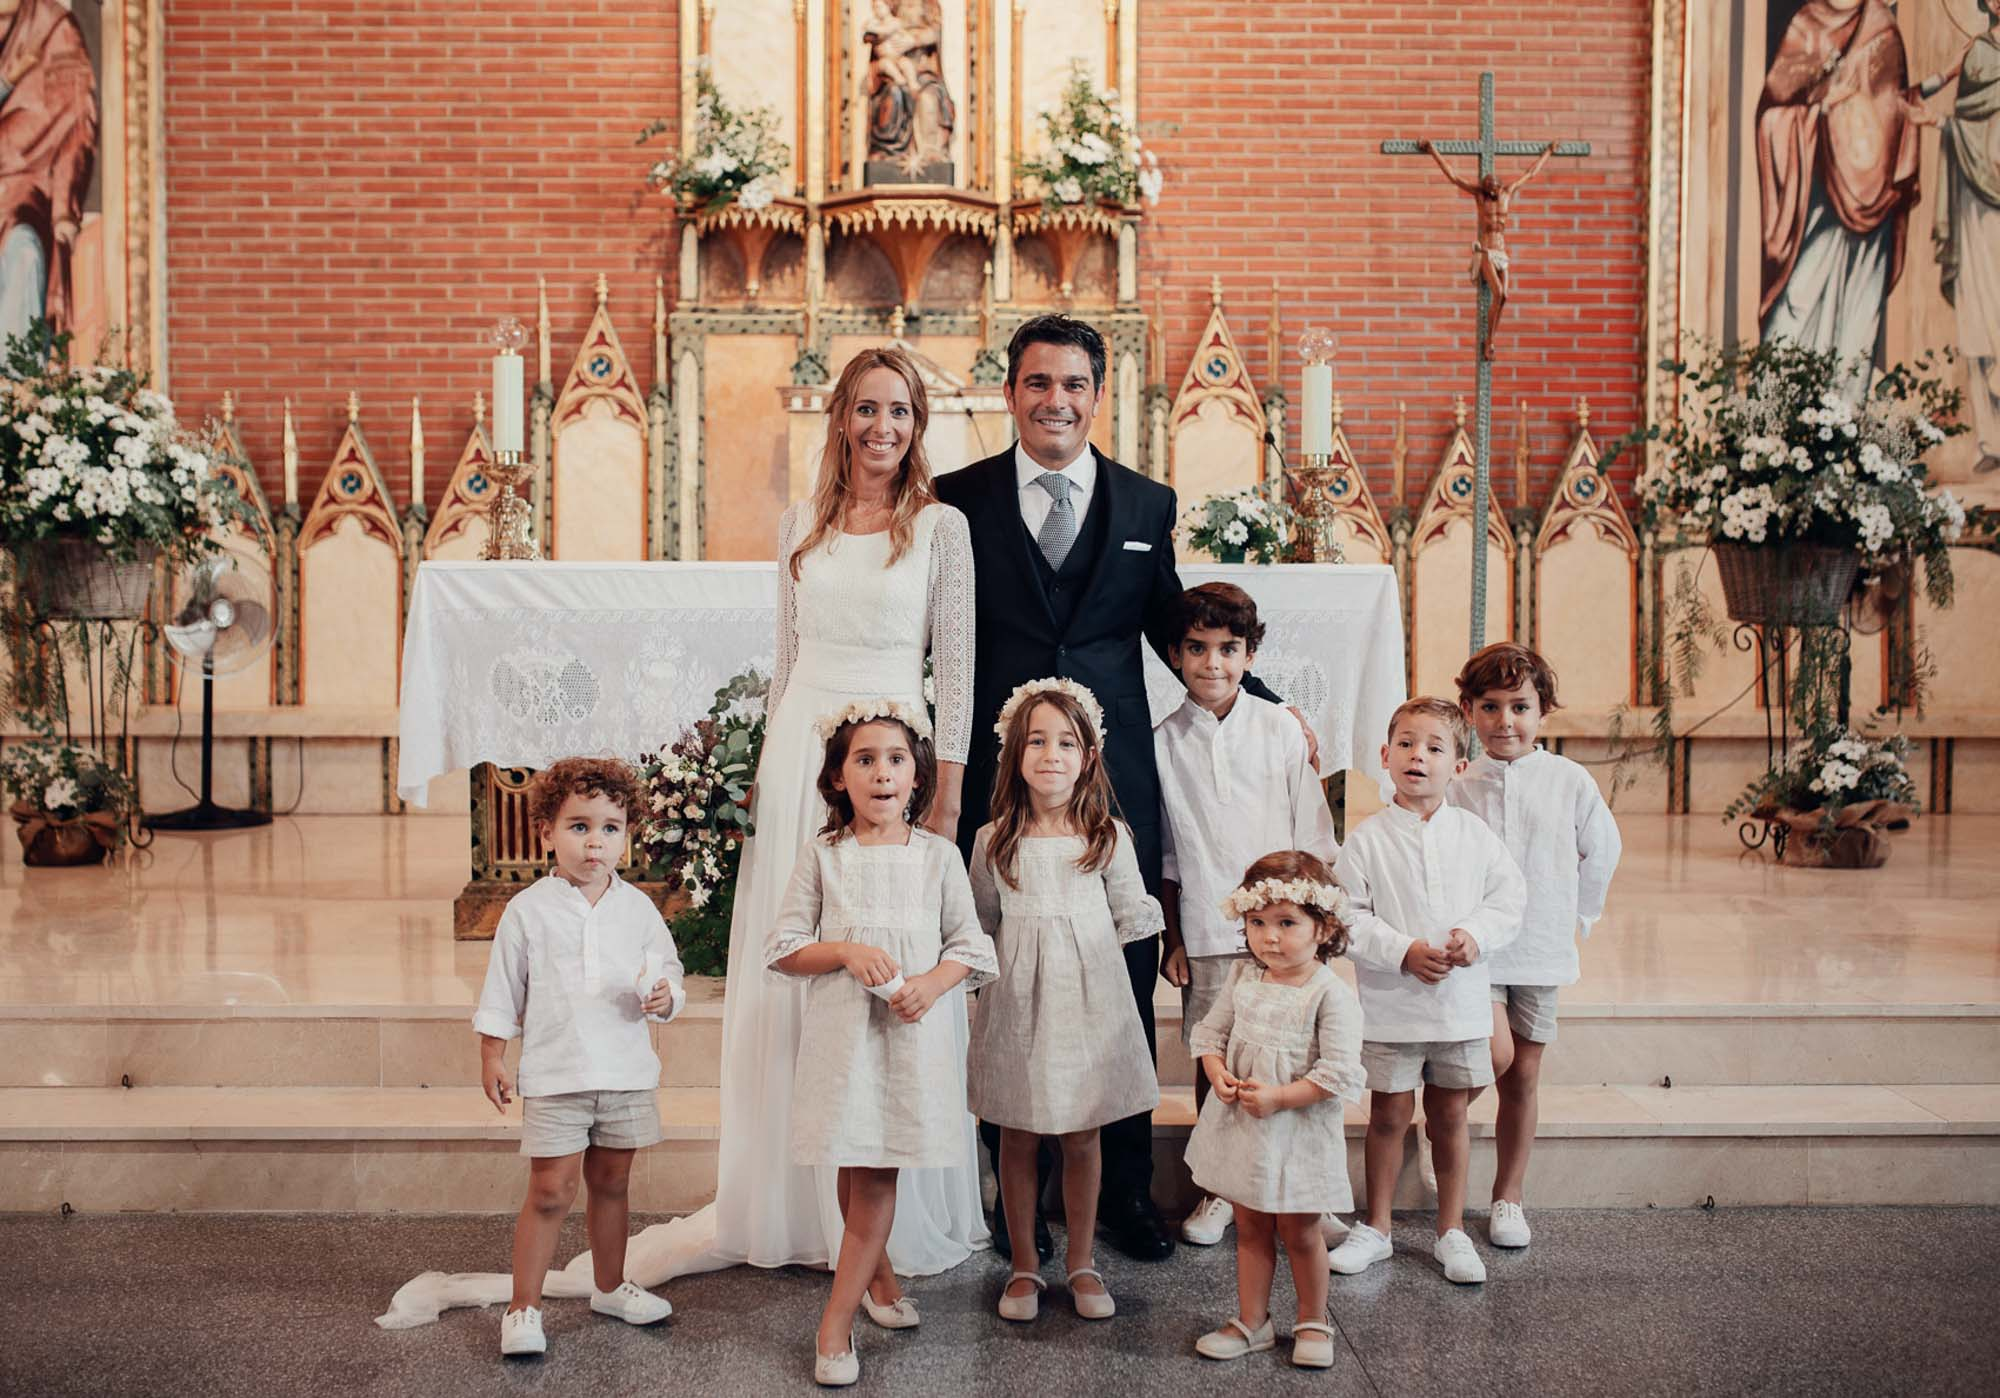 iglesia wedding niños novios flores altar matrimonio cabo de palos fotografia